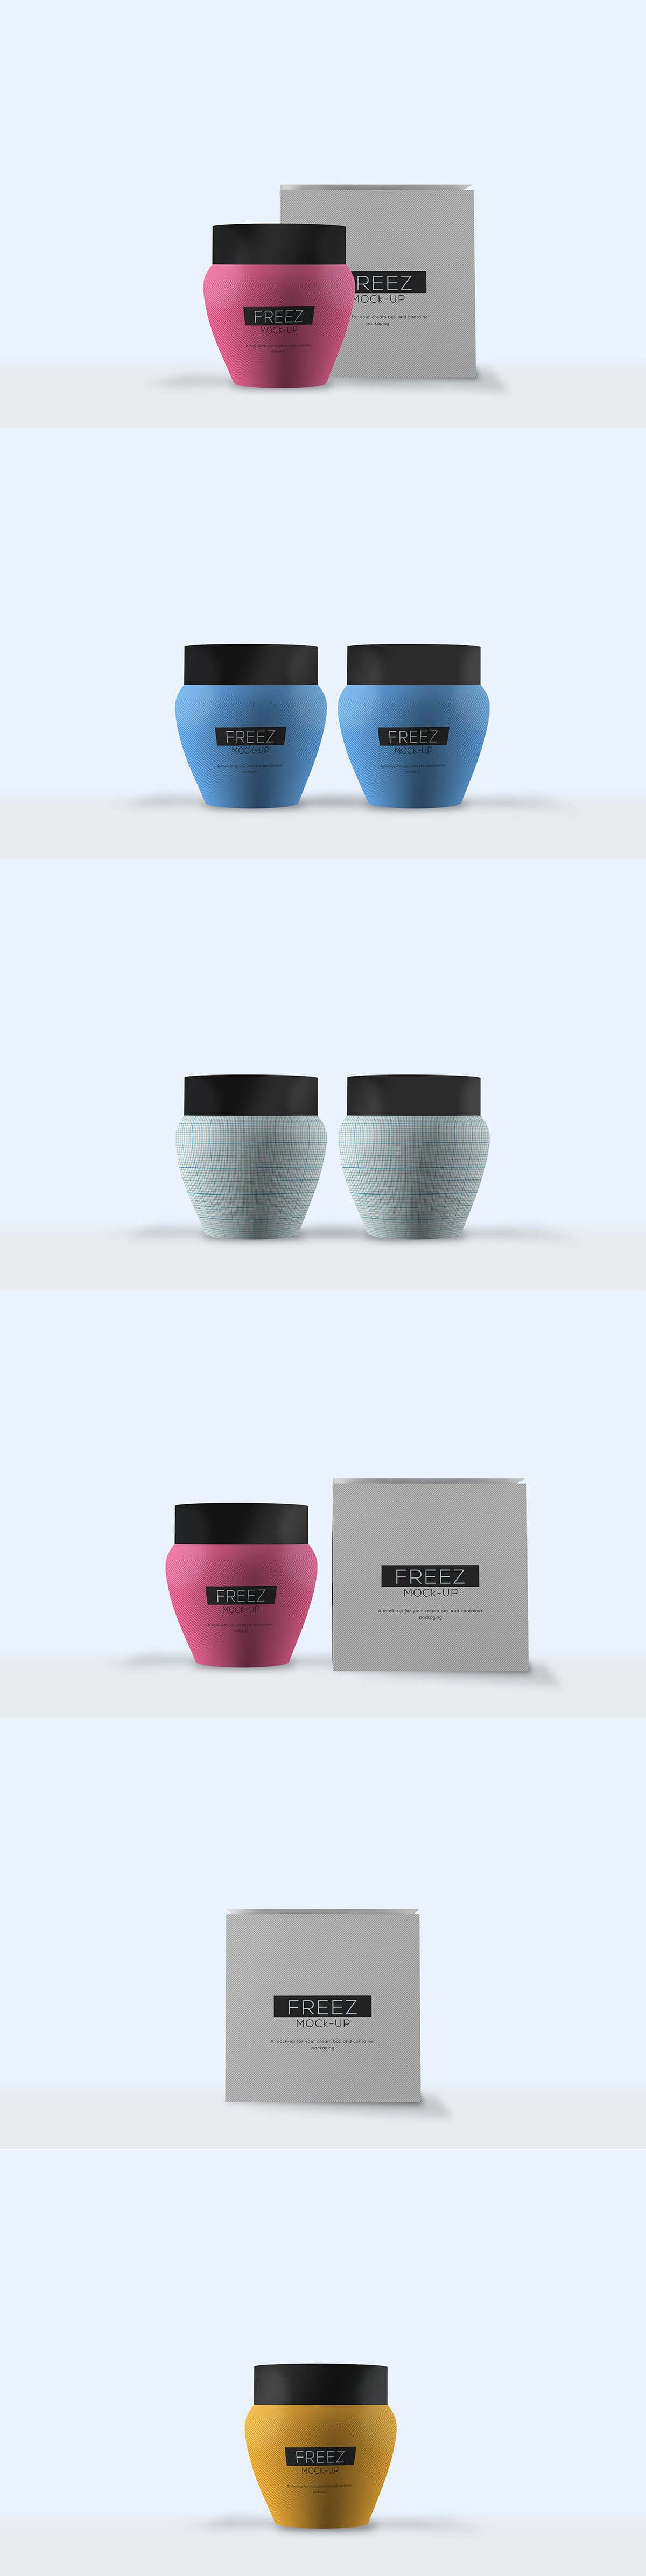 Free Cosmetics Cream Packaging Mockup